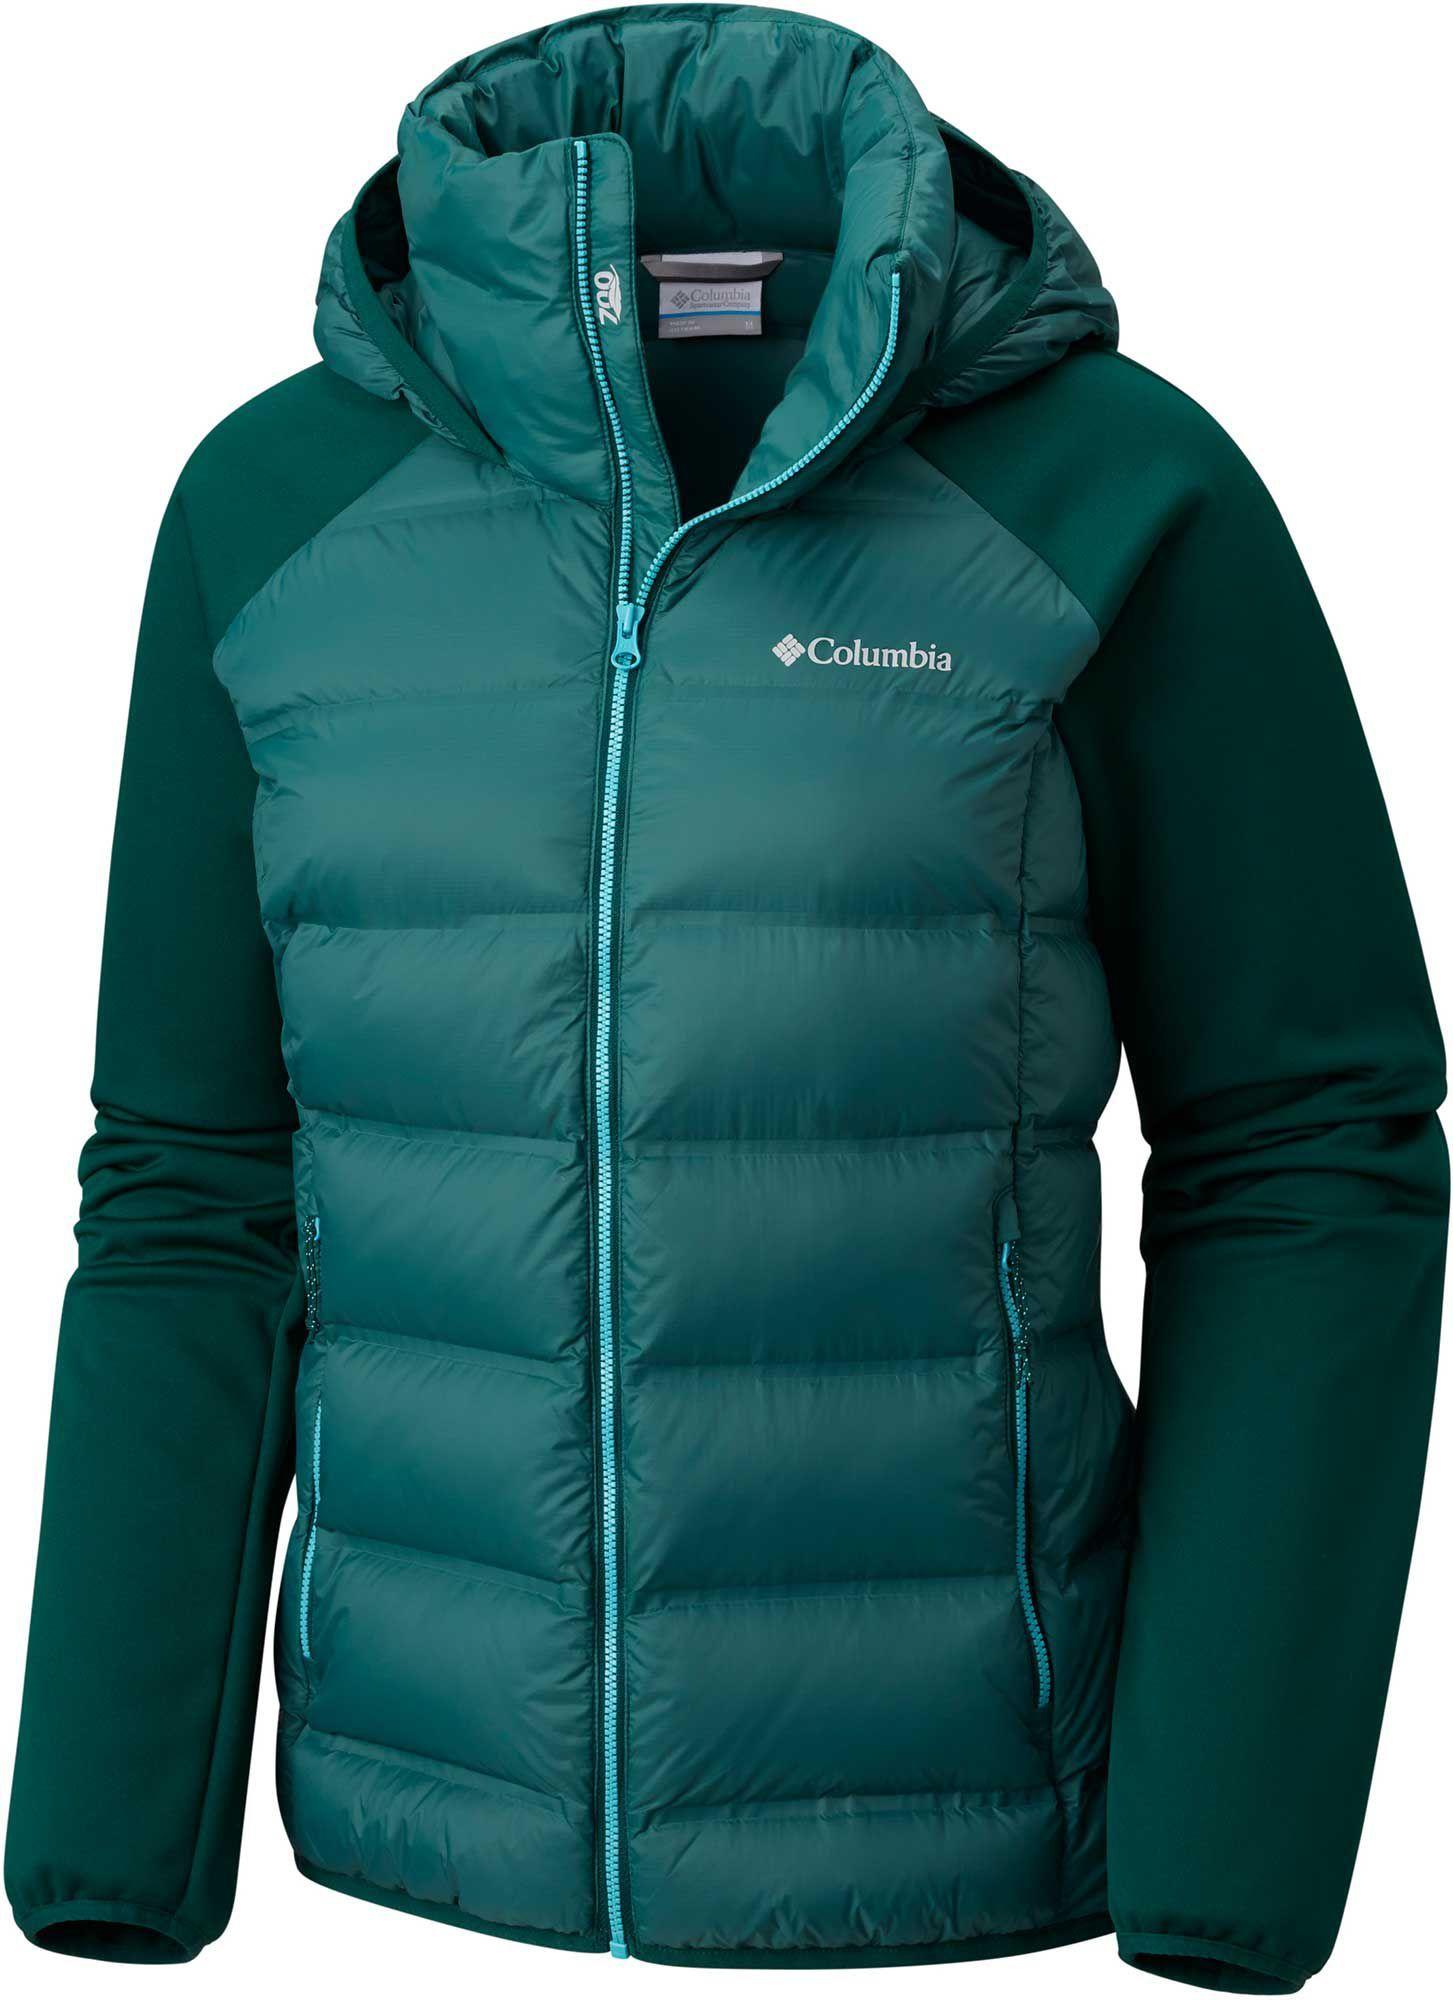 34dab39051a Columbia Women's Explorer Falls Hybrid Jacket | Women's Clothing ...